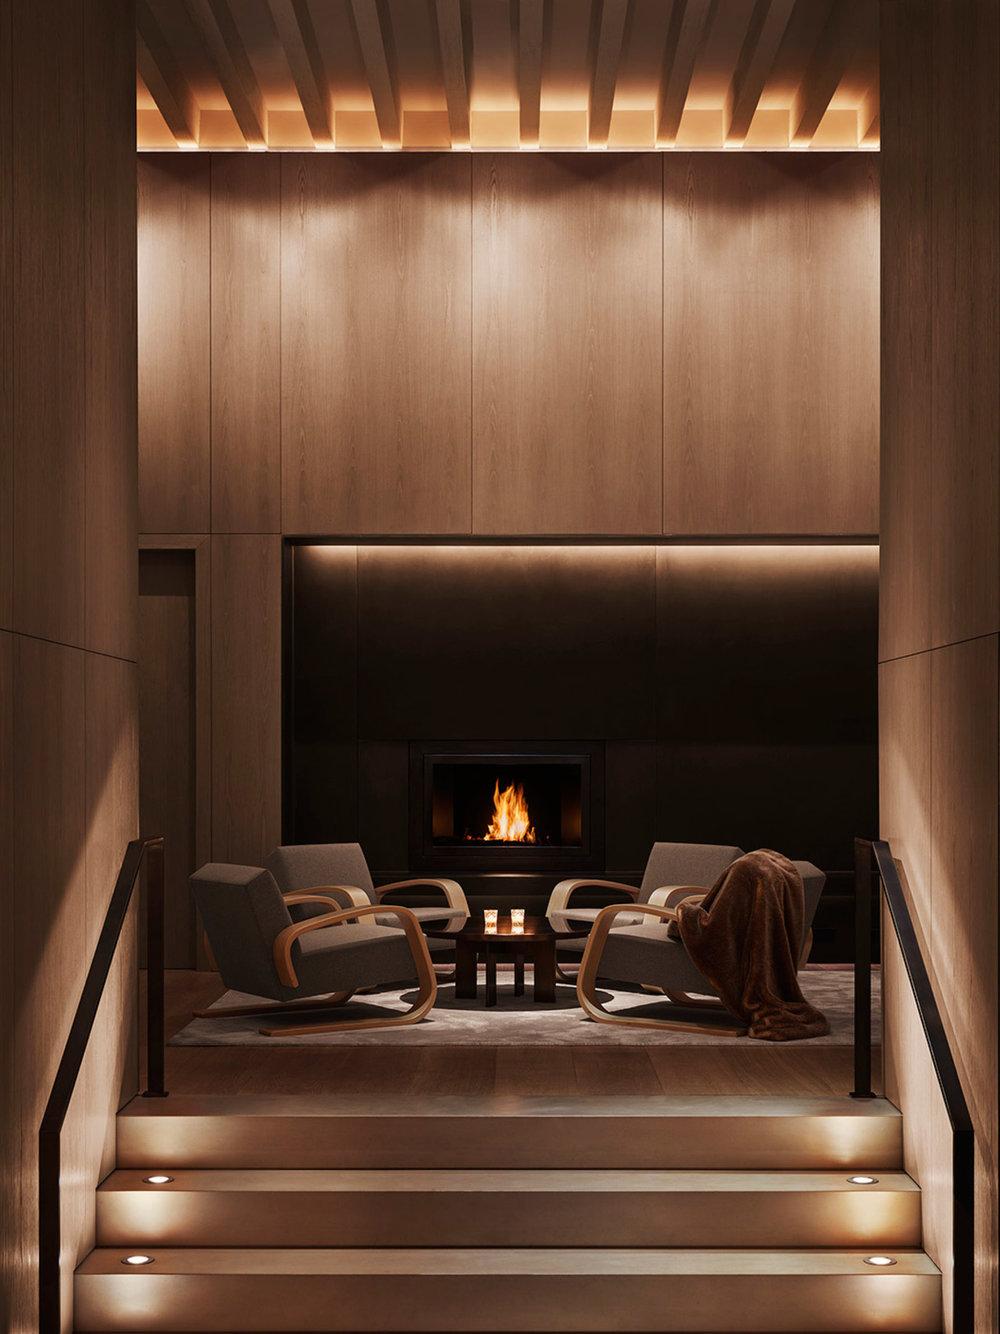 Lobby-fireplace-1048x1400.jpg